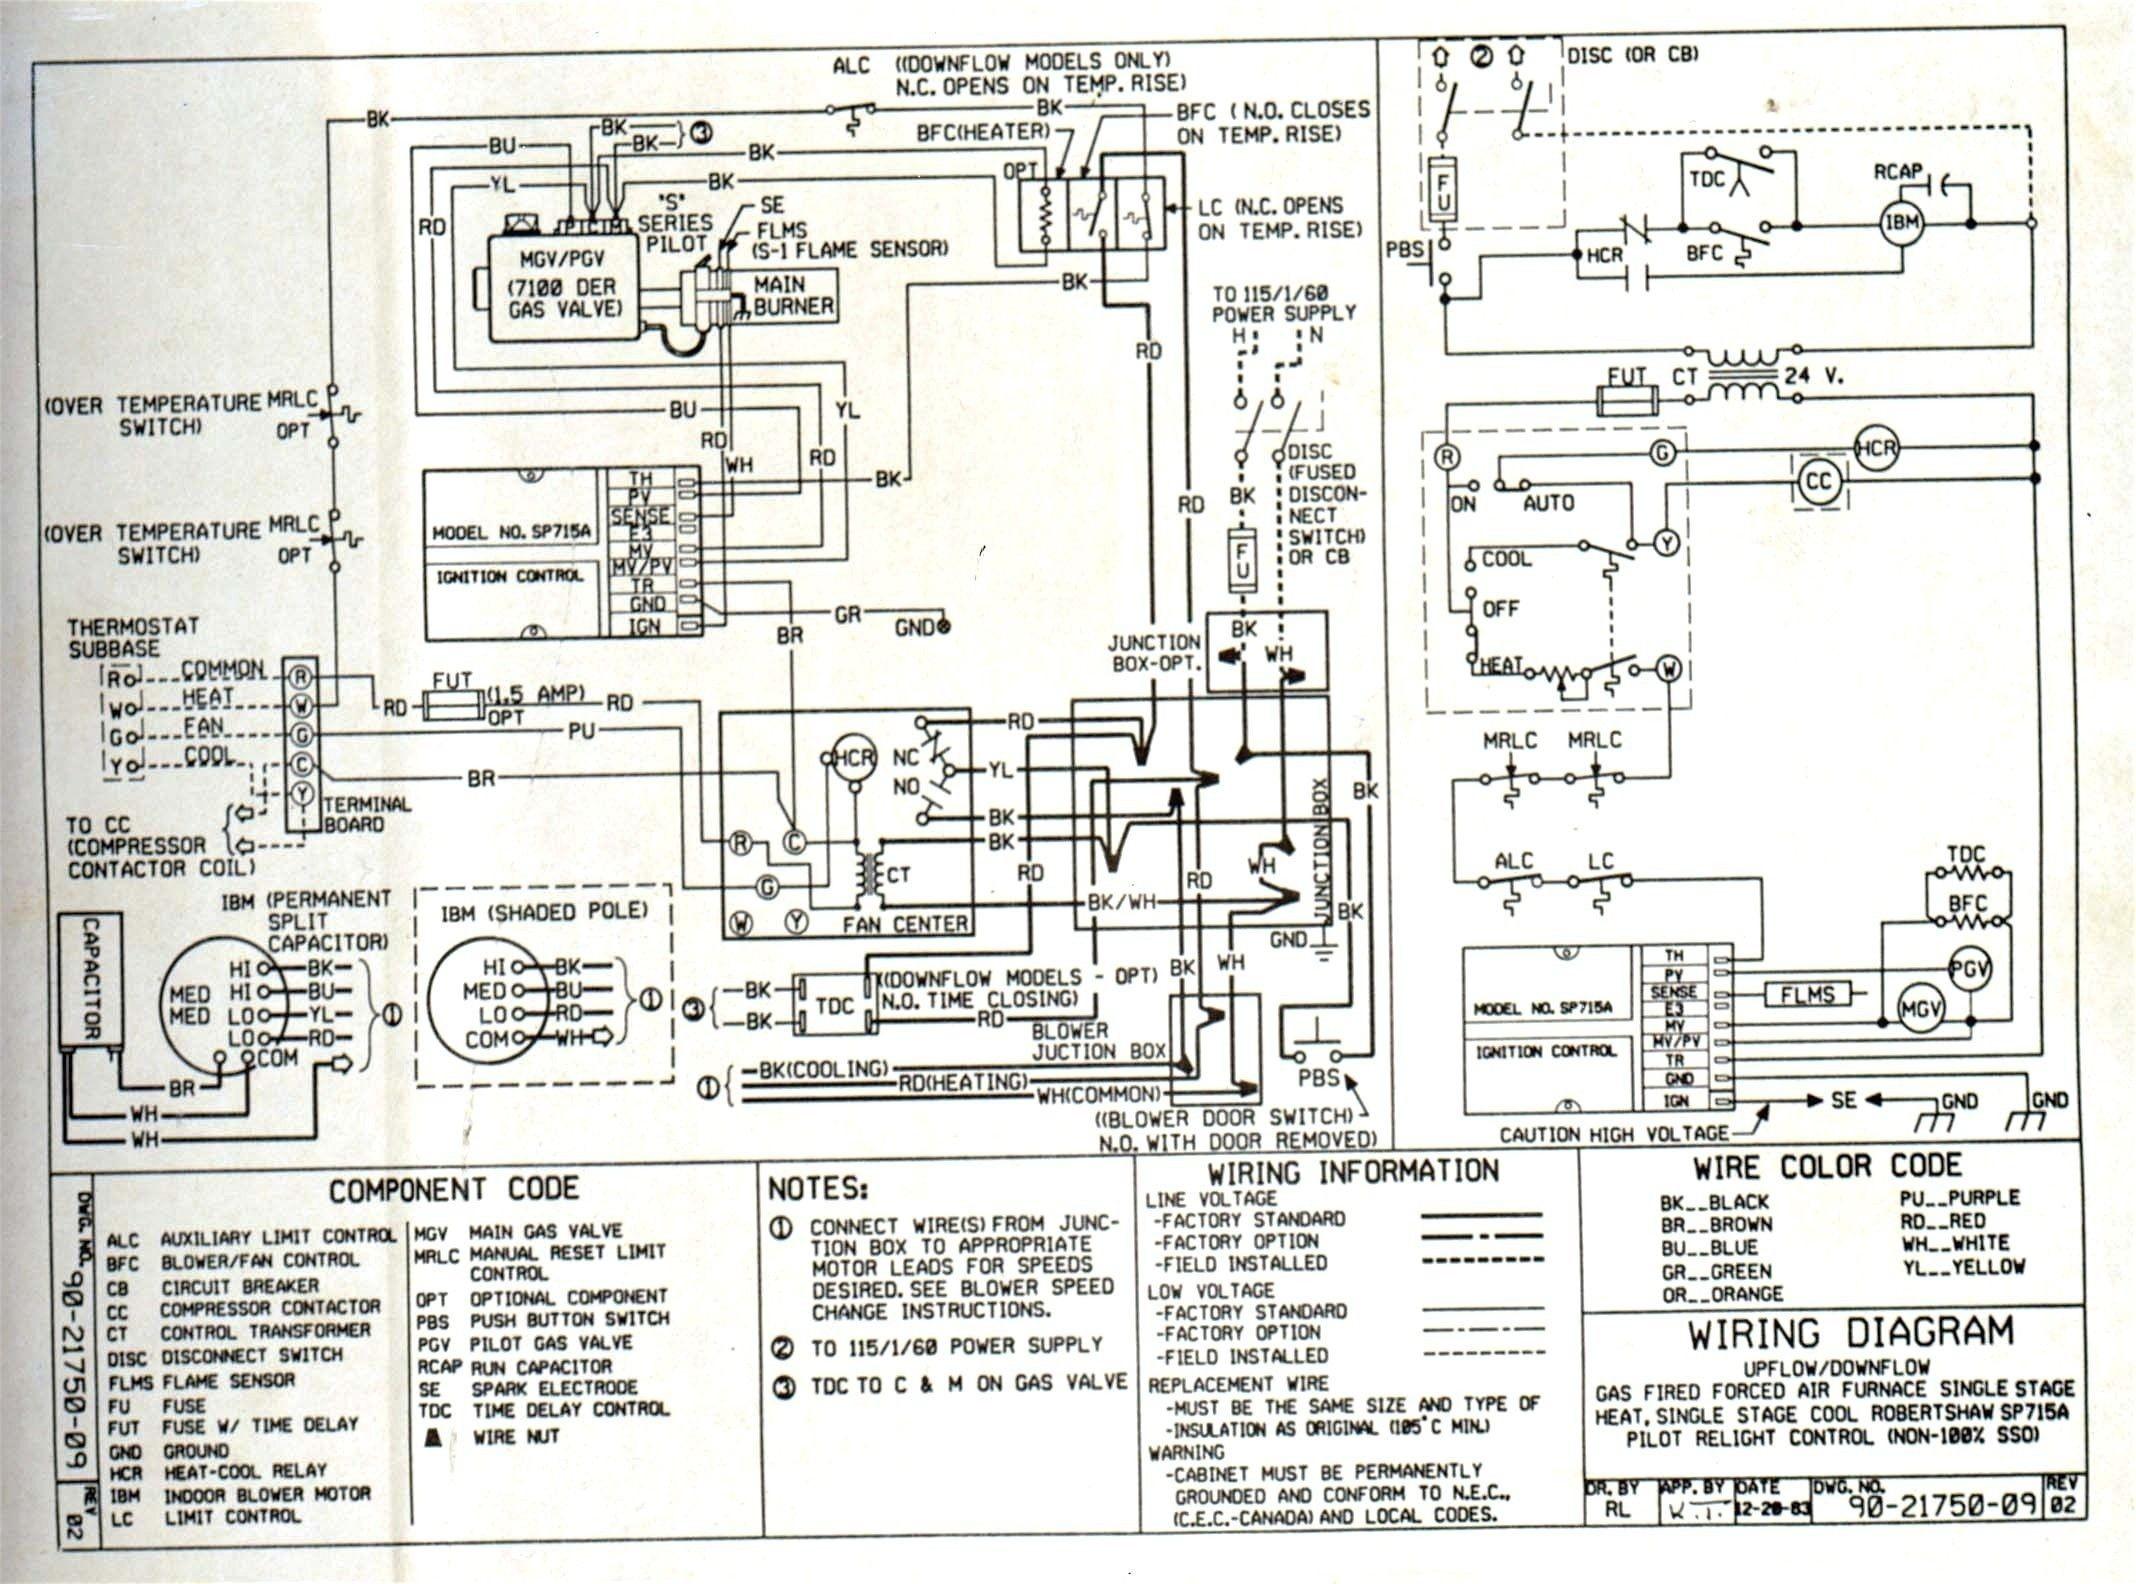 Monarch Dump Motor Wiring Diagram Unique Panel Wiring Diagram Diagram Wiringdiagram Of Monarch Dump Motor Wiring Diagram Mm 5922] Car Lift Hydraulic Pump Diagram Download Diagram